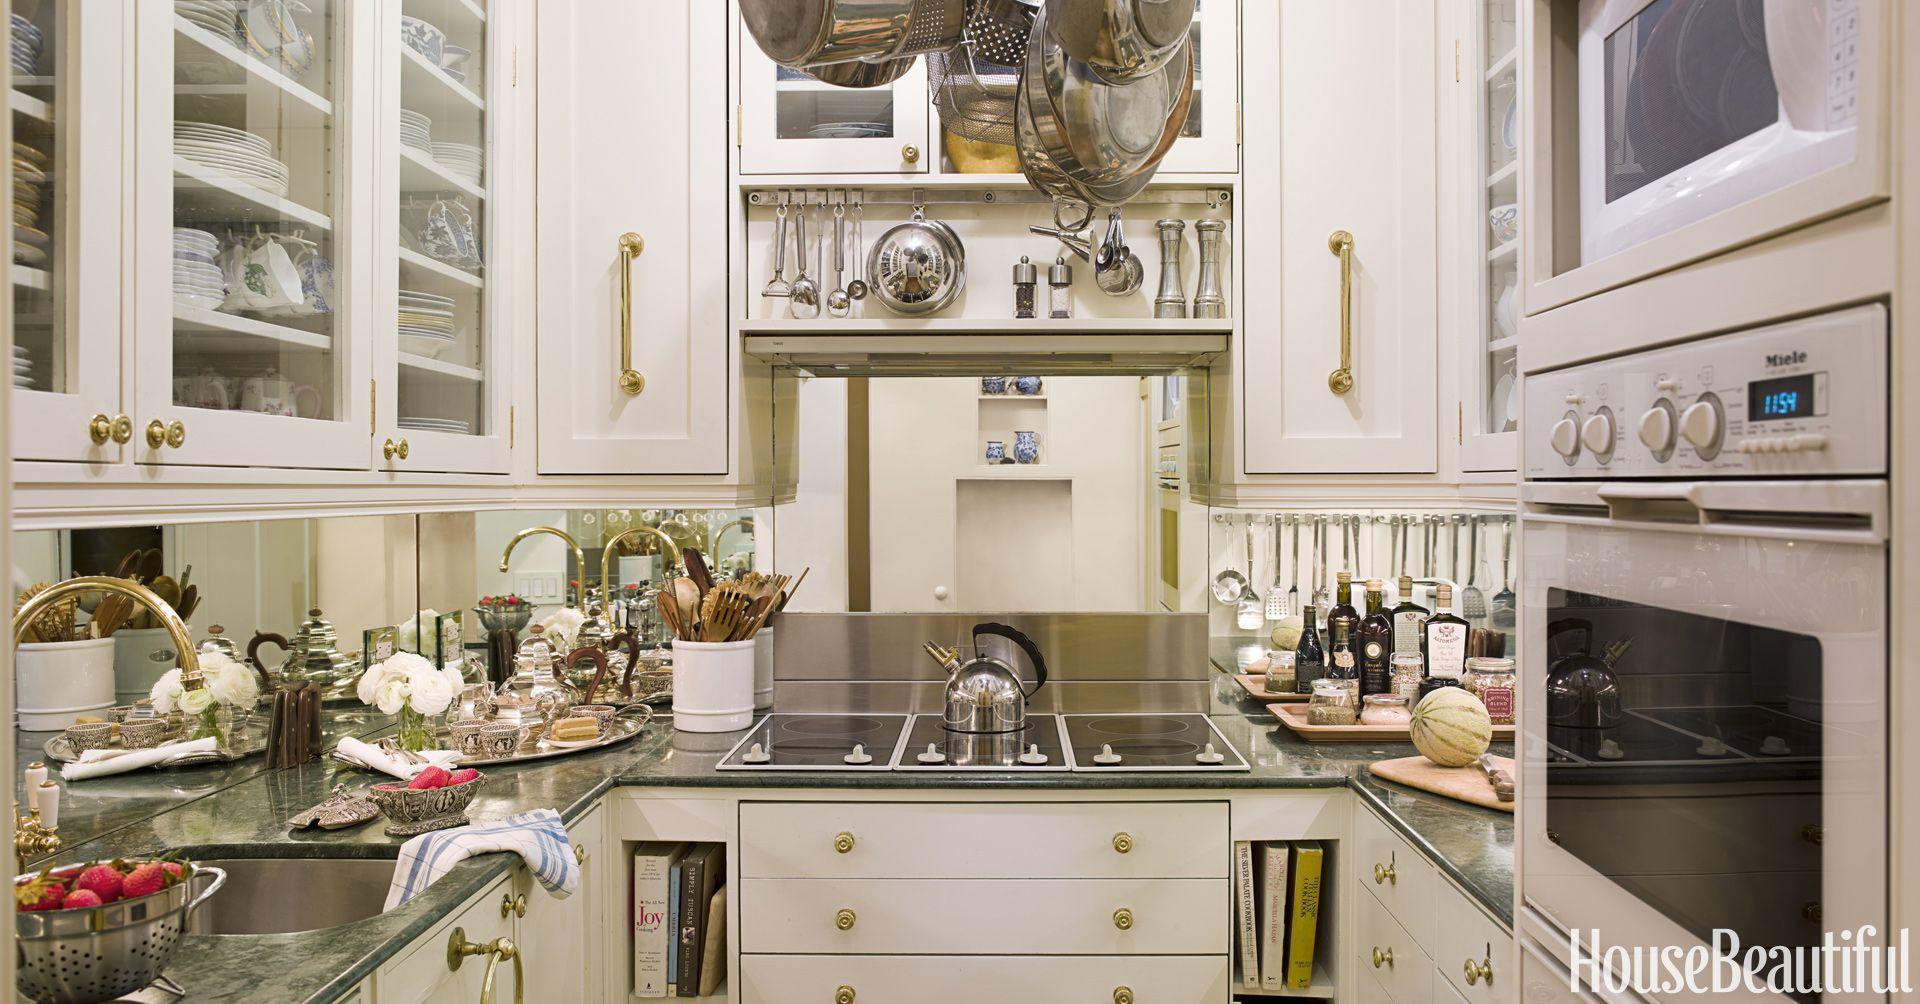 New York   Small   Efficient   Kitchens   Designs